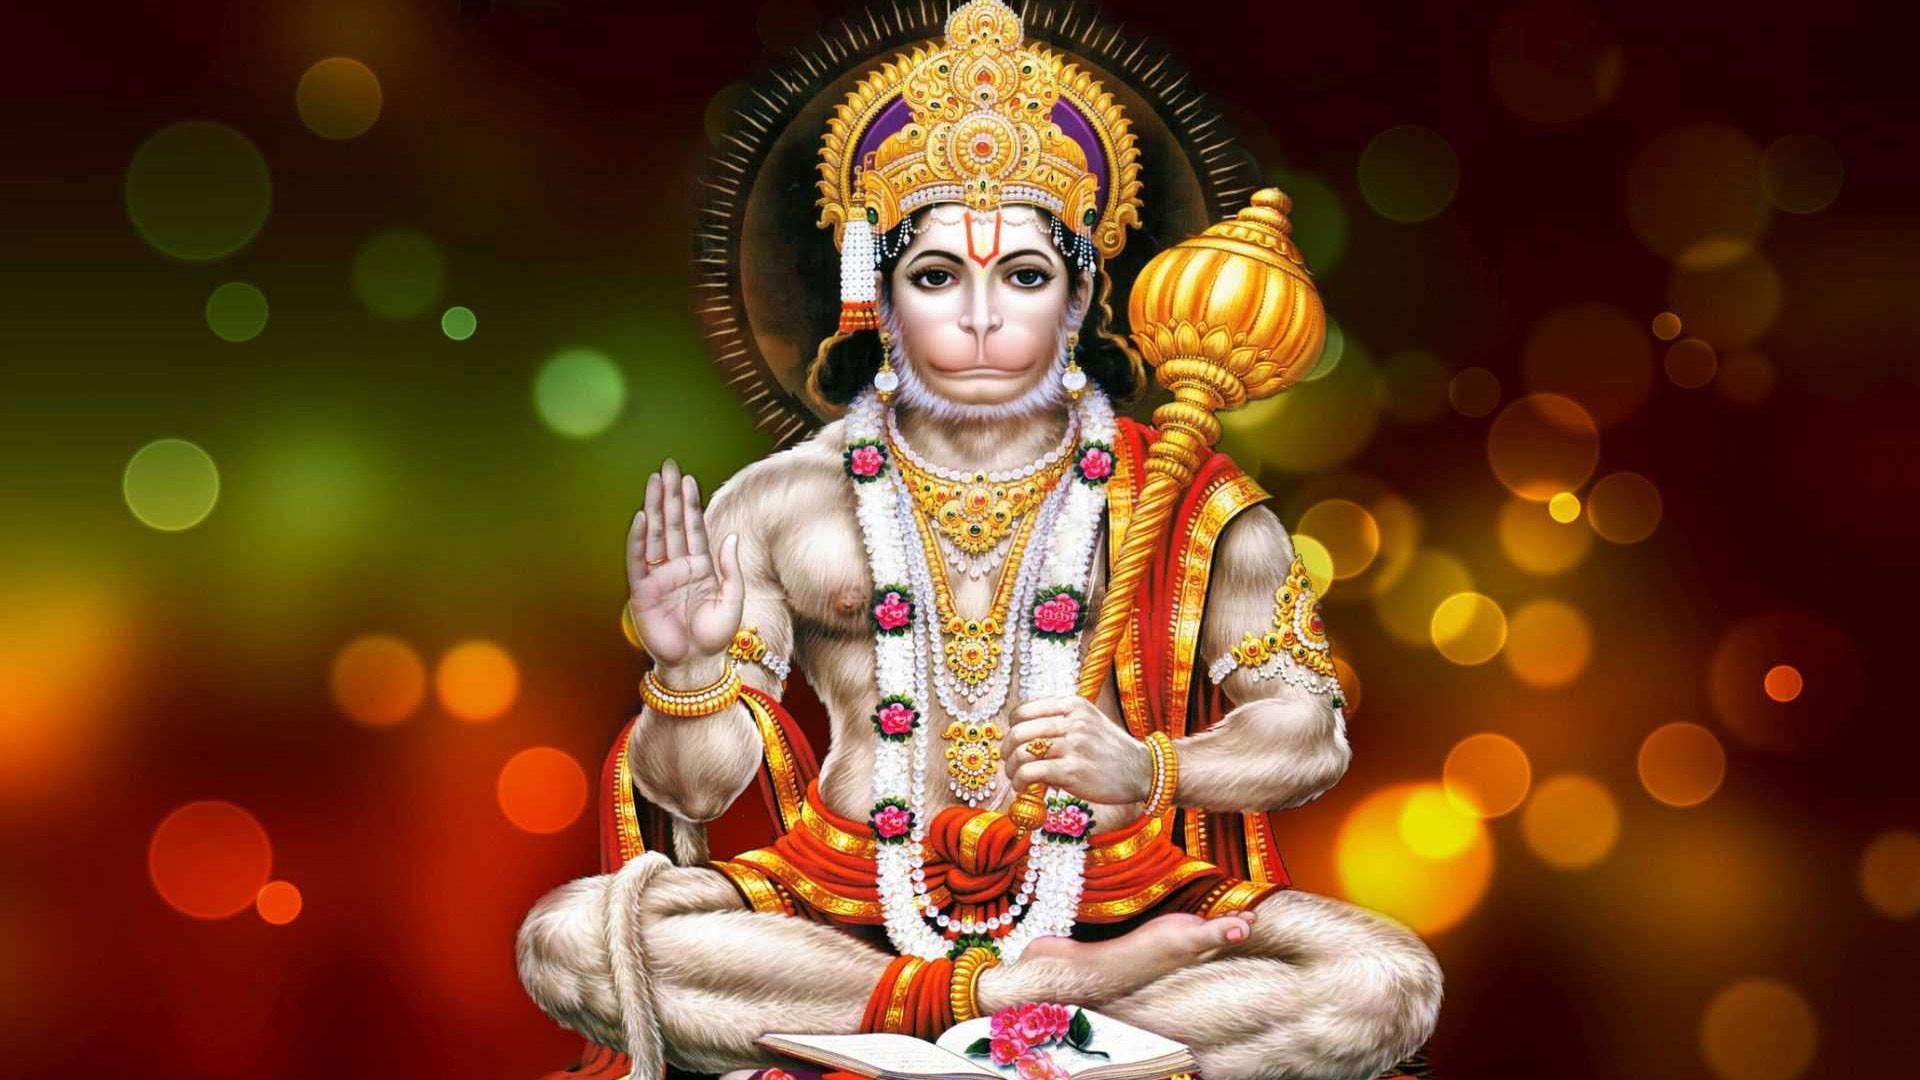 Good Wallpaper Lord Hindu - 37198  Image_80331.jpg